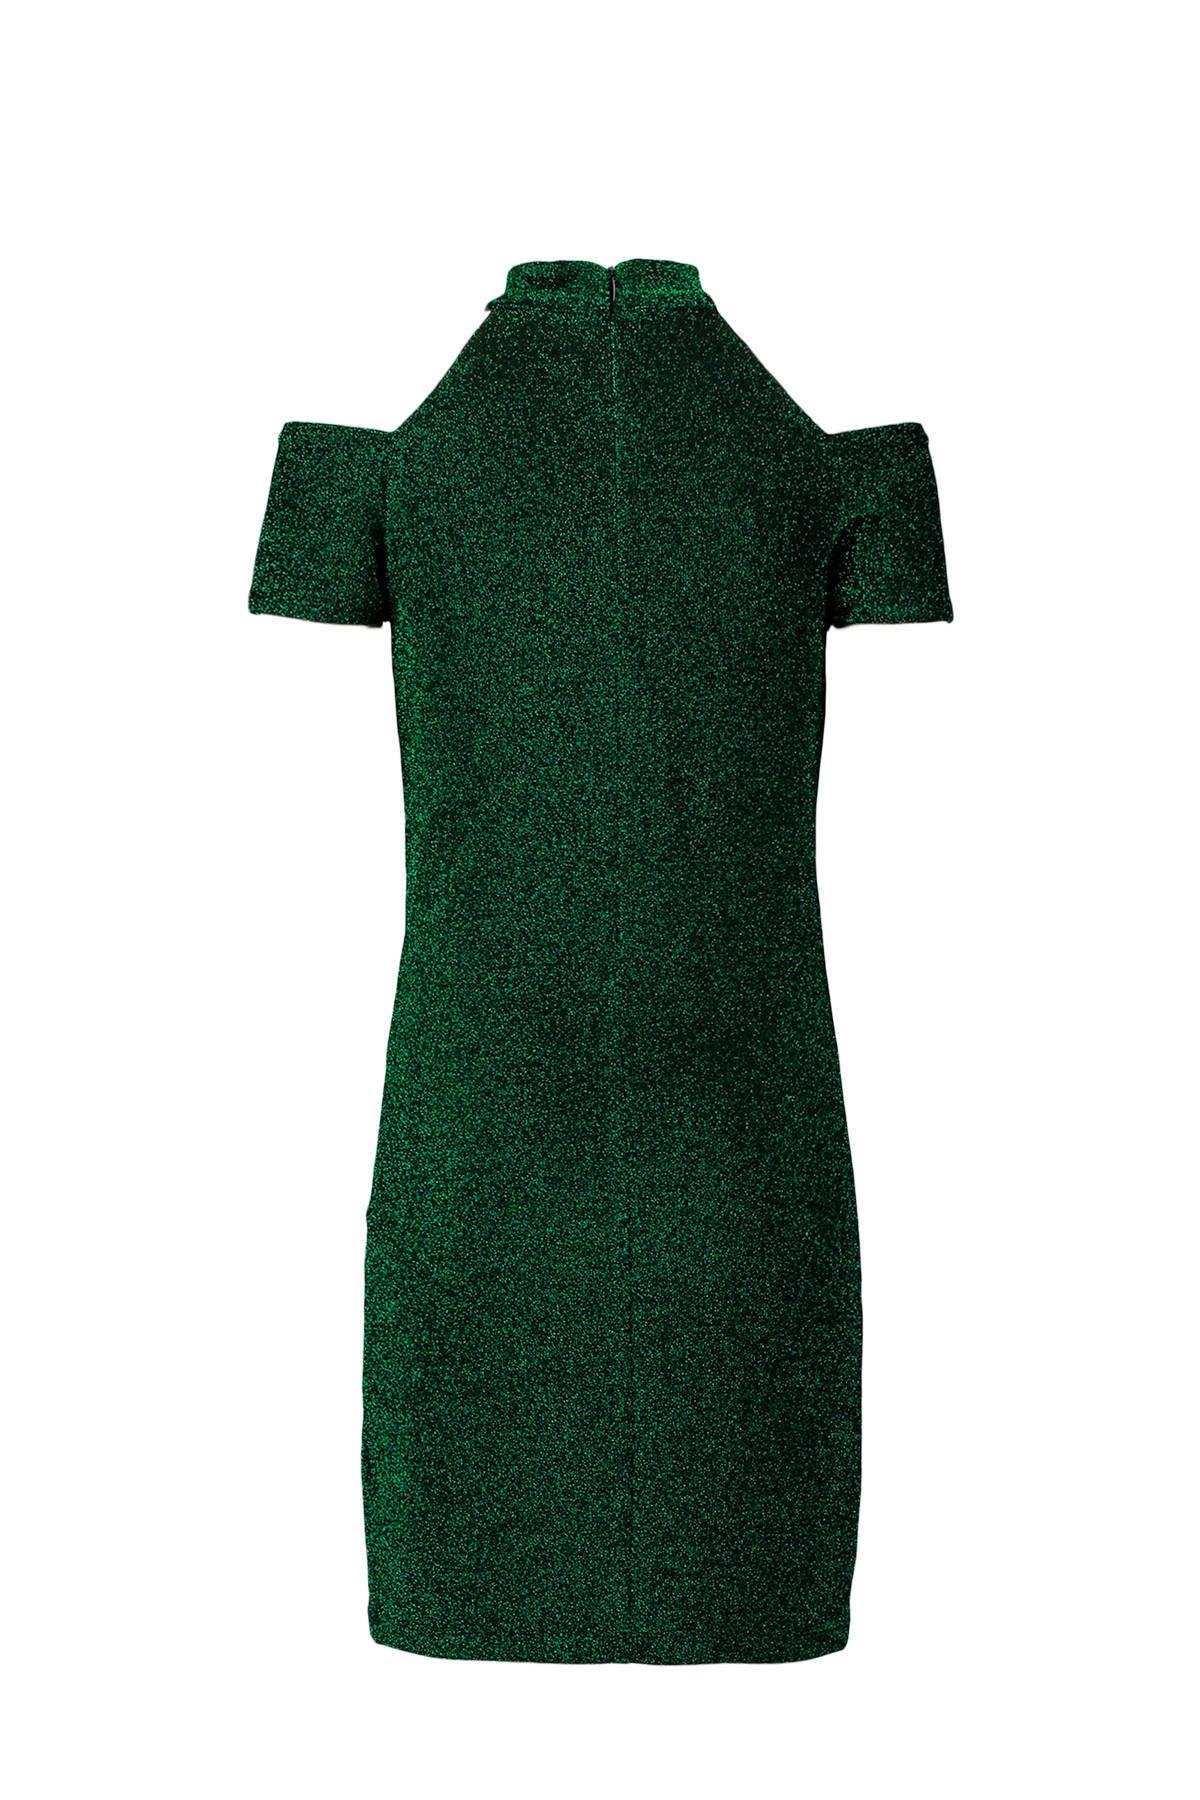 groene glitter jurk